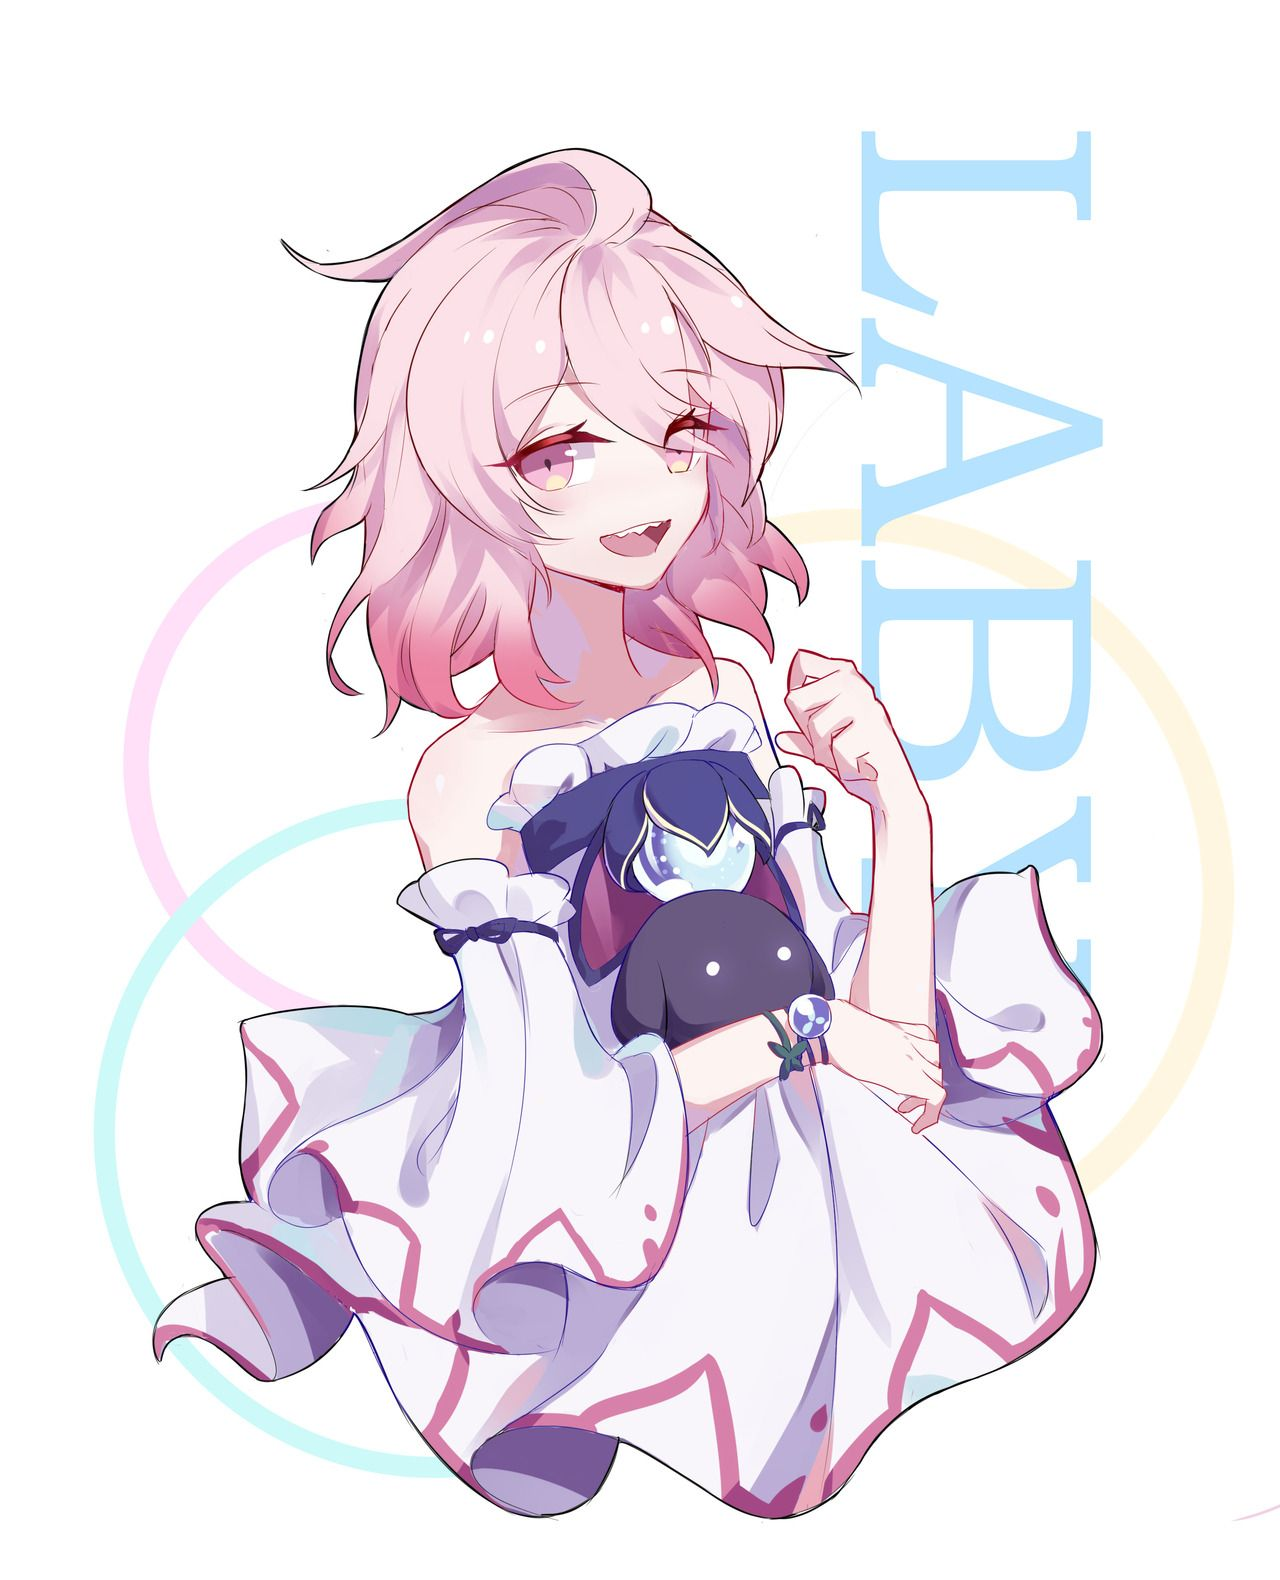 Laby elsword tumblr anime life all anime anime art anime girls